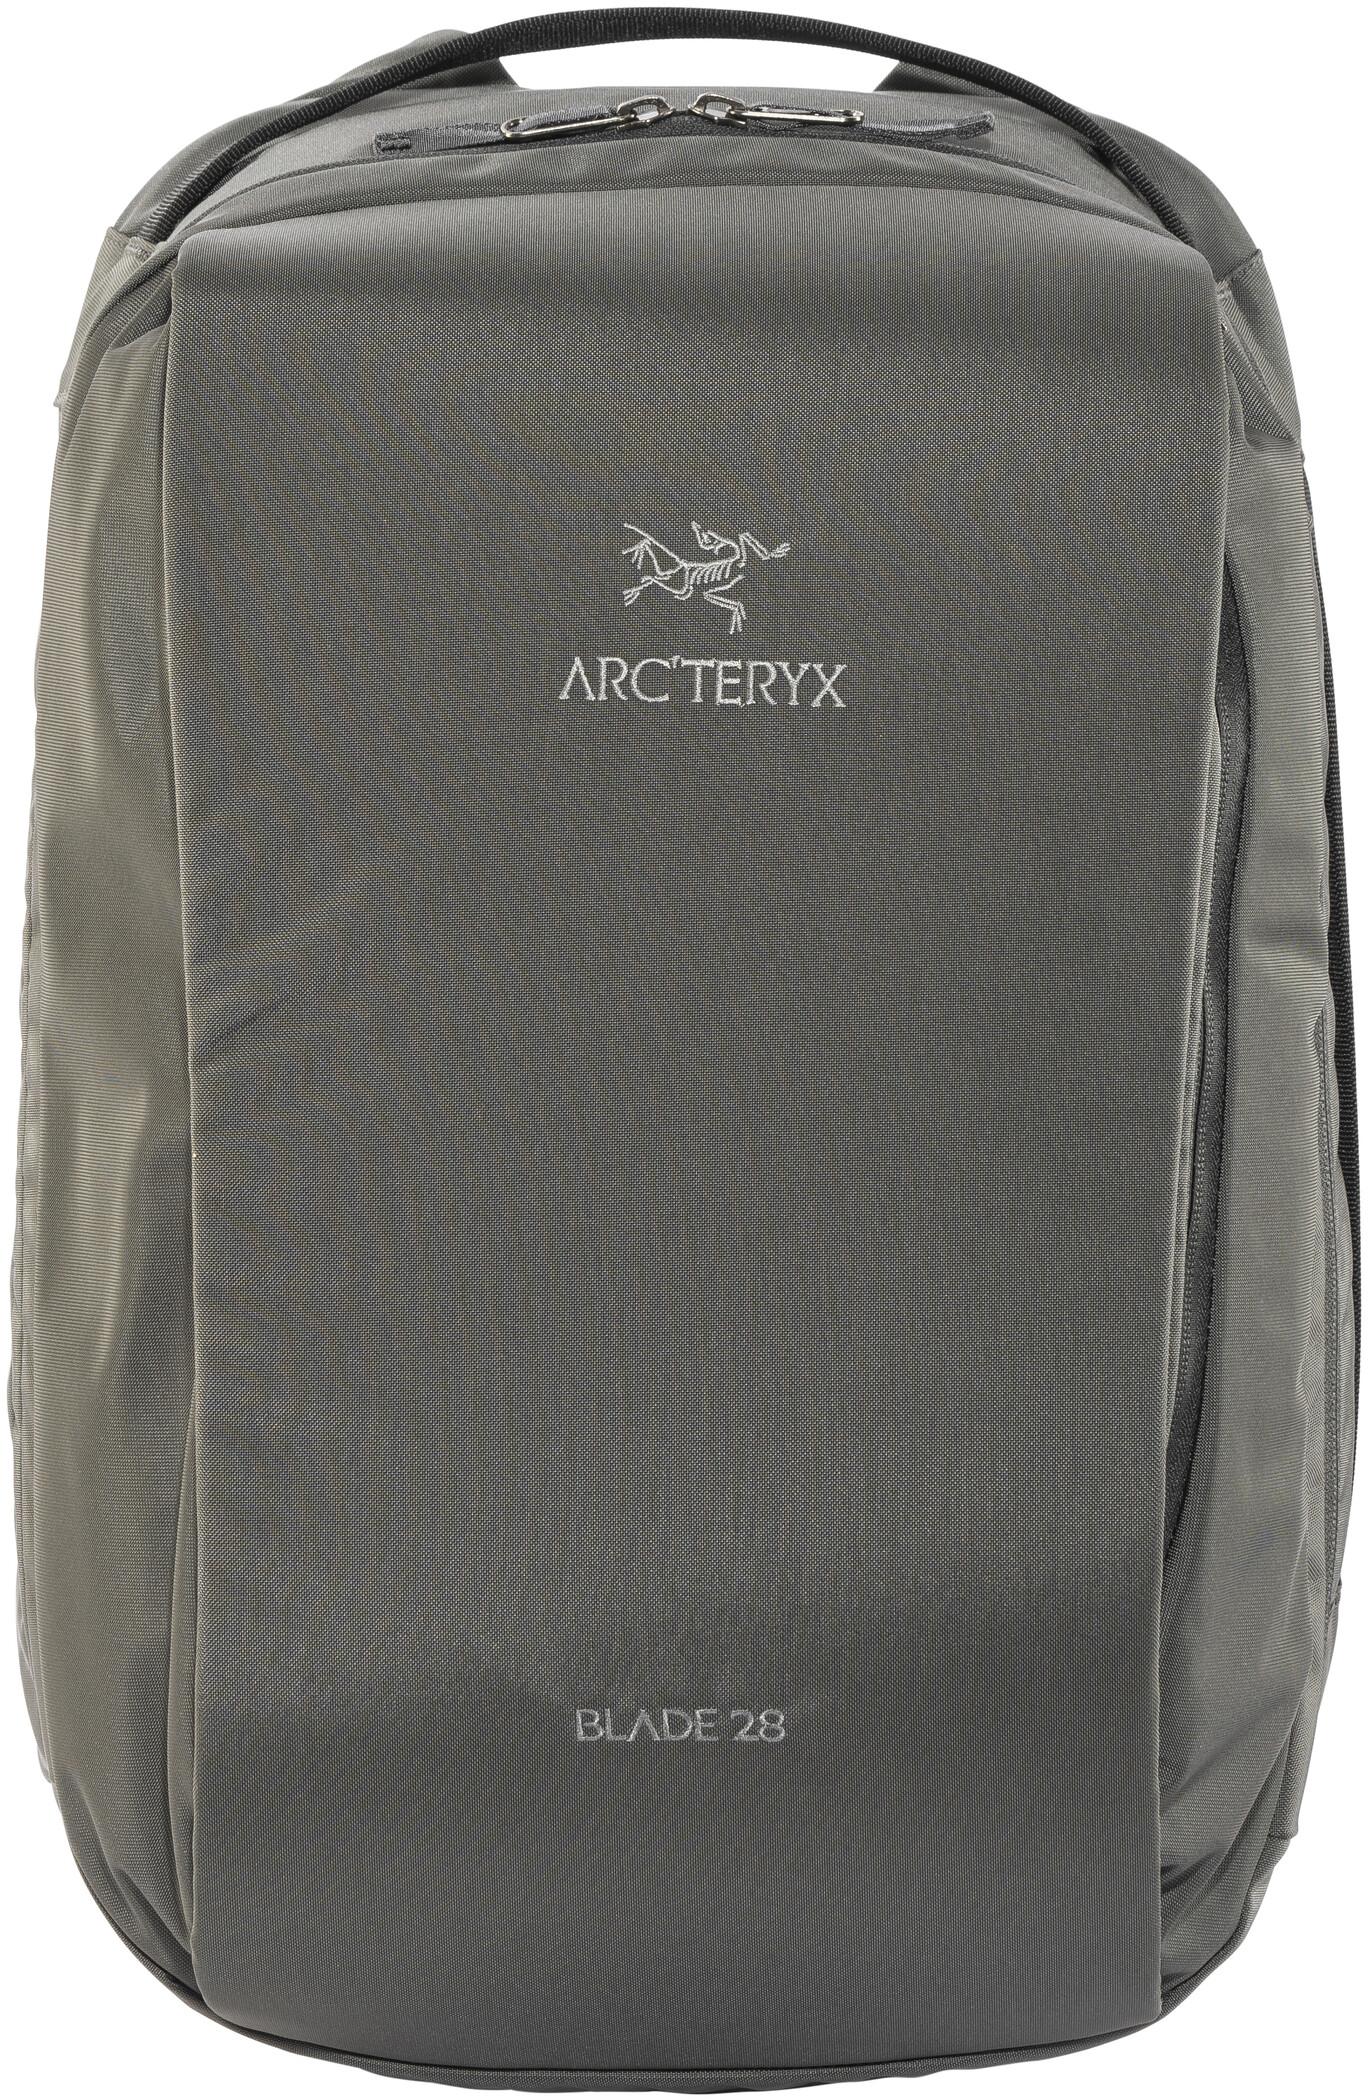 Arc'teryx Blade 28 Rygsæk, pilot (2019)   Travel bags